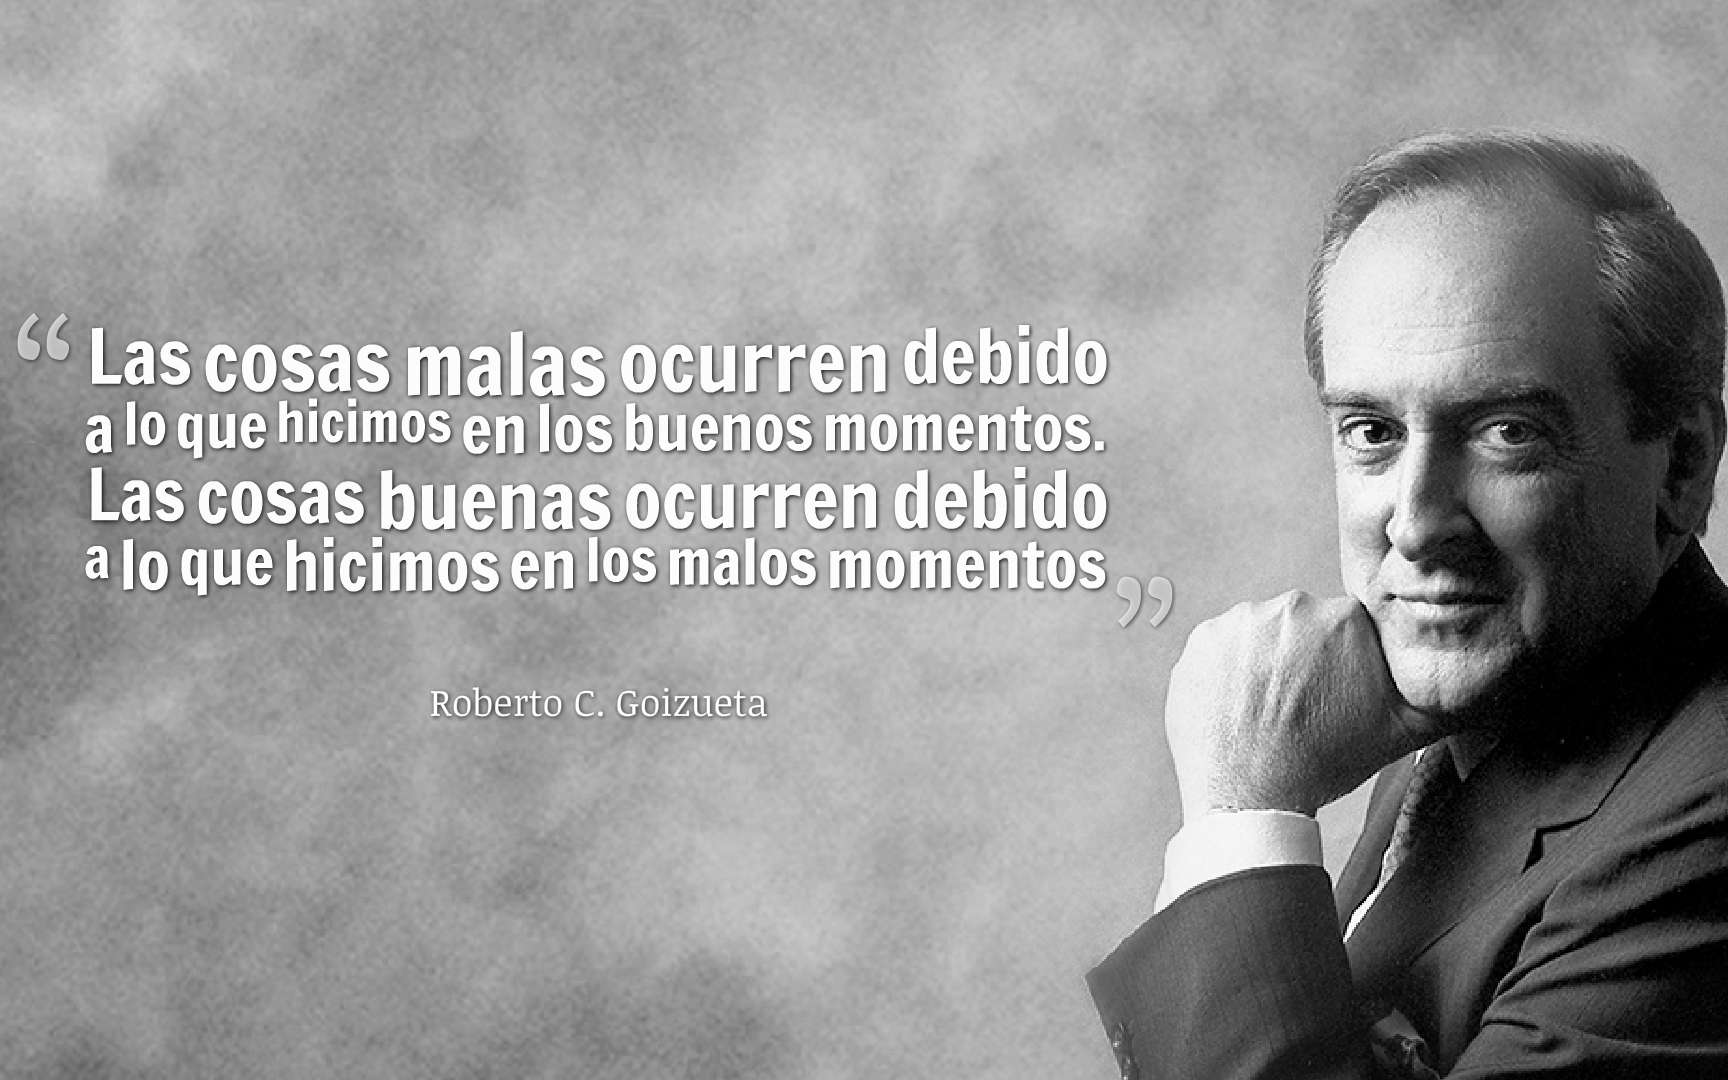 Principios del éxito por Roberto C. Goizueta